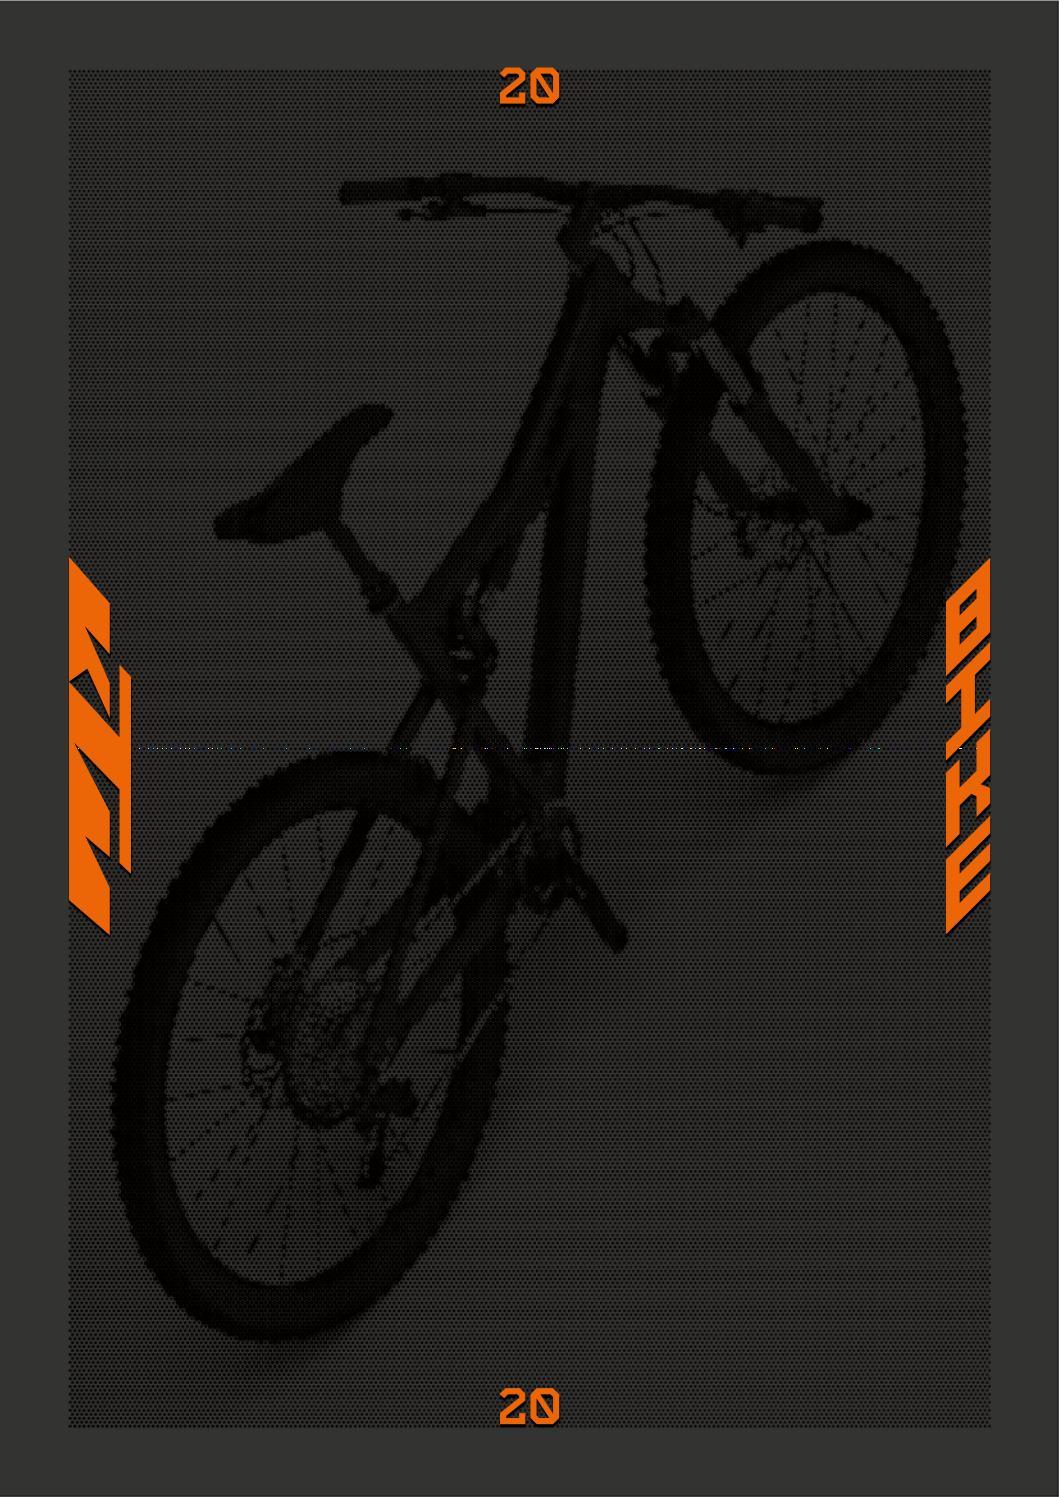 KINK BIKES LIGHTEST ALLOY BICYCLE MATTE SONIC BLUE BARENDS